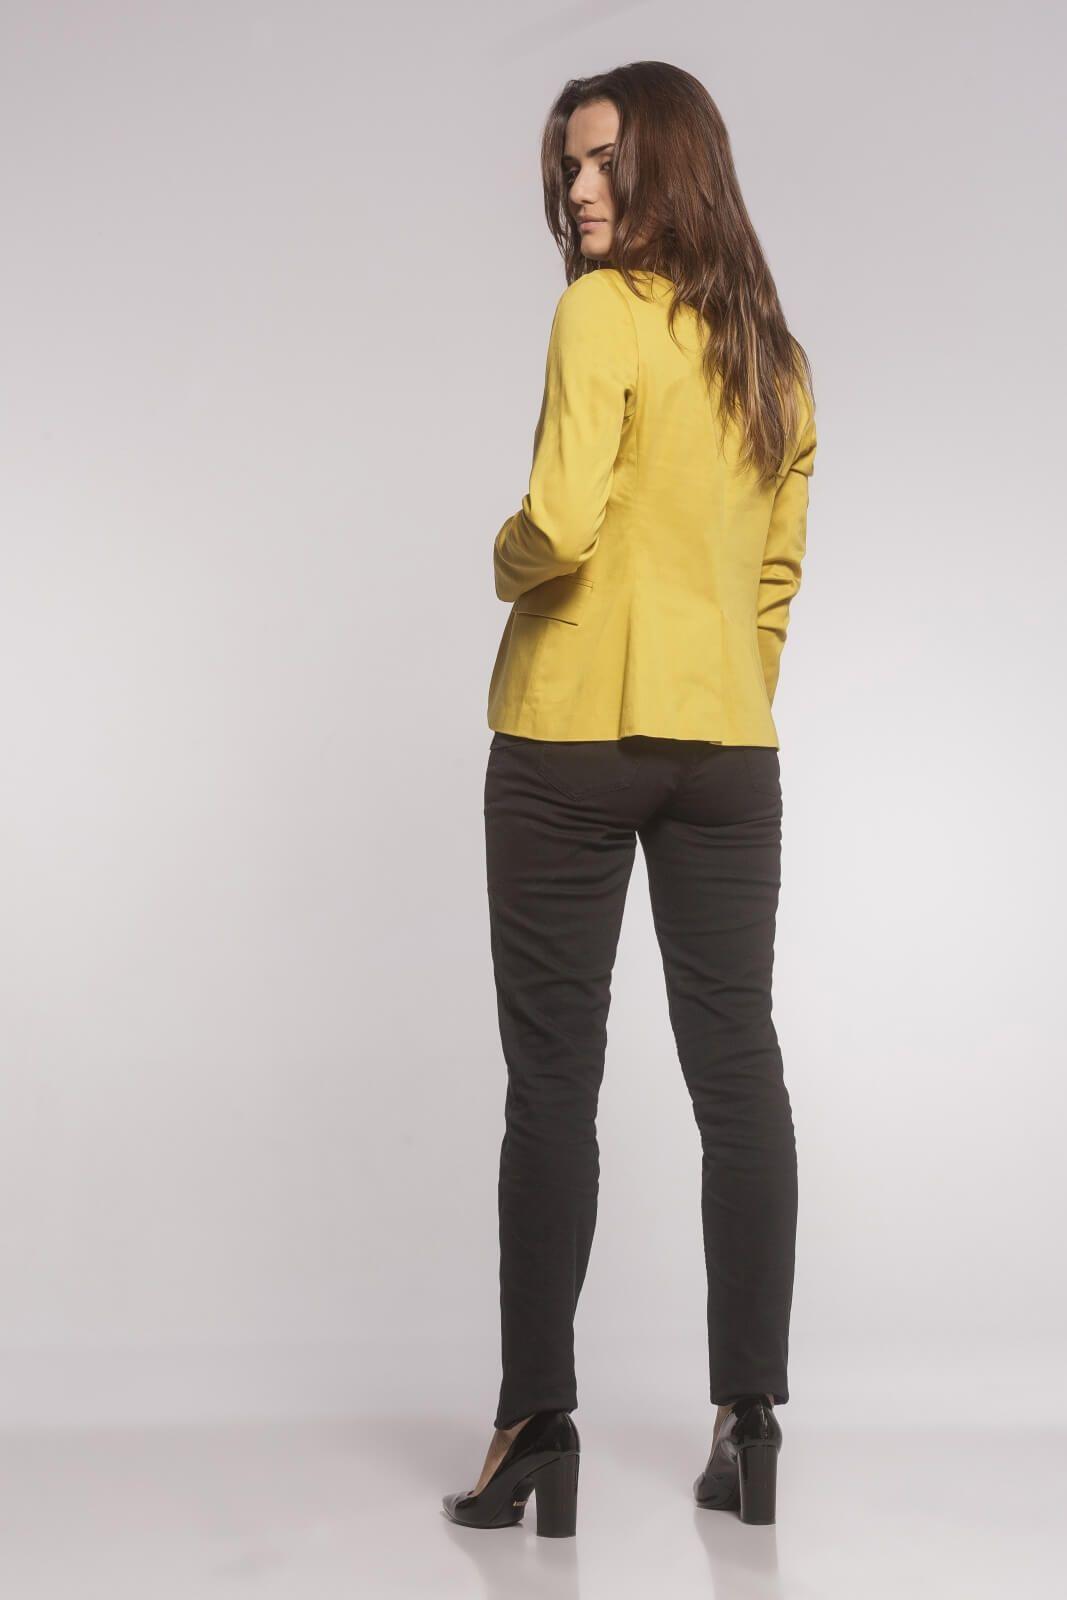 Blazer Feminino Clássico Sarja Amarelo